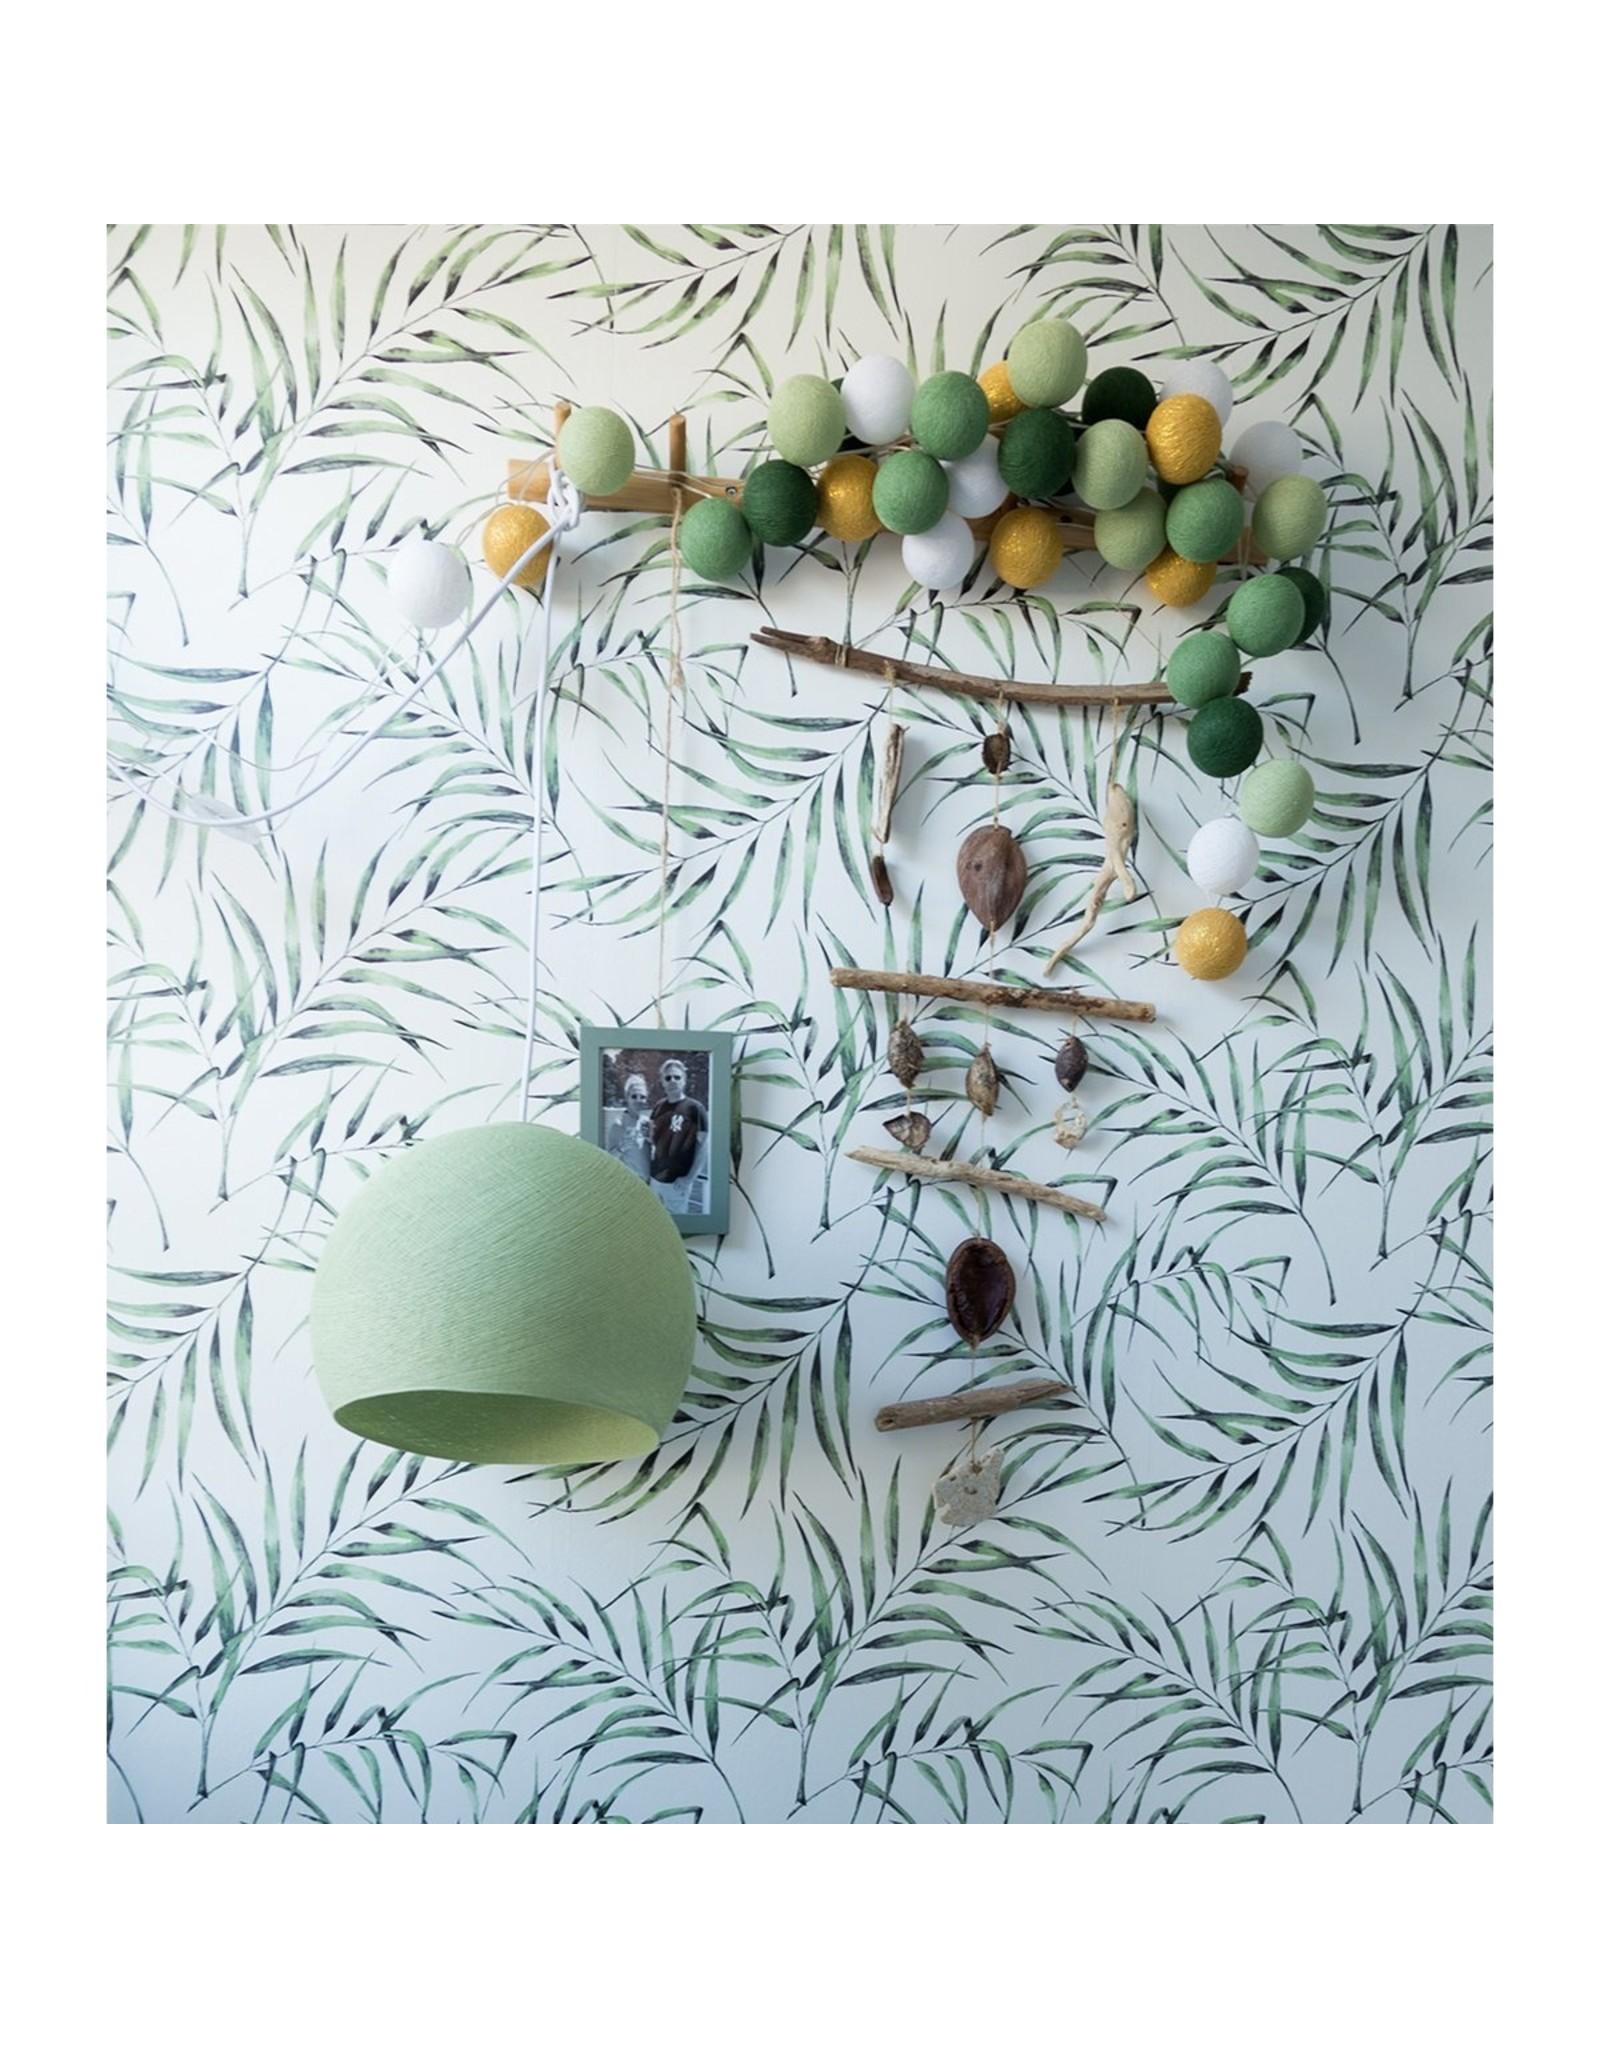 Cotton Ball Lichtslinger: Sparkling palm